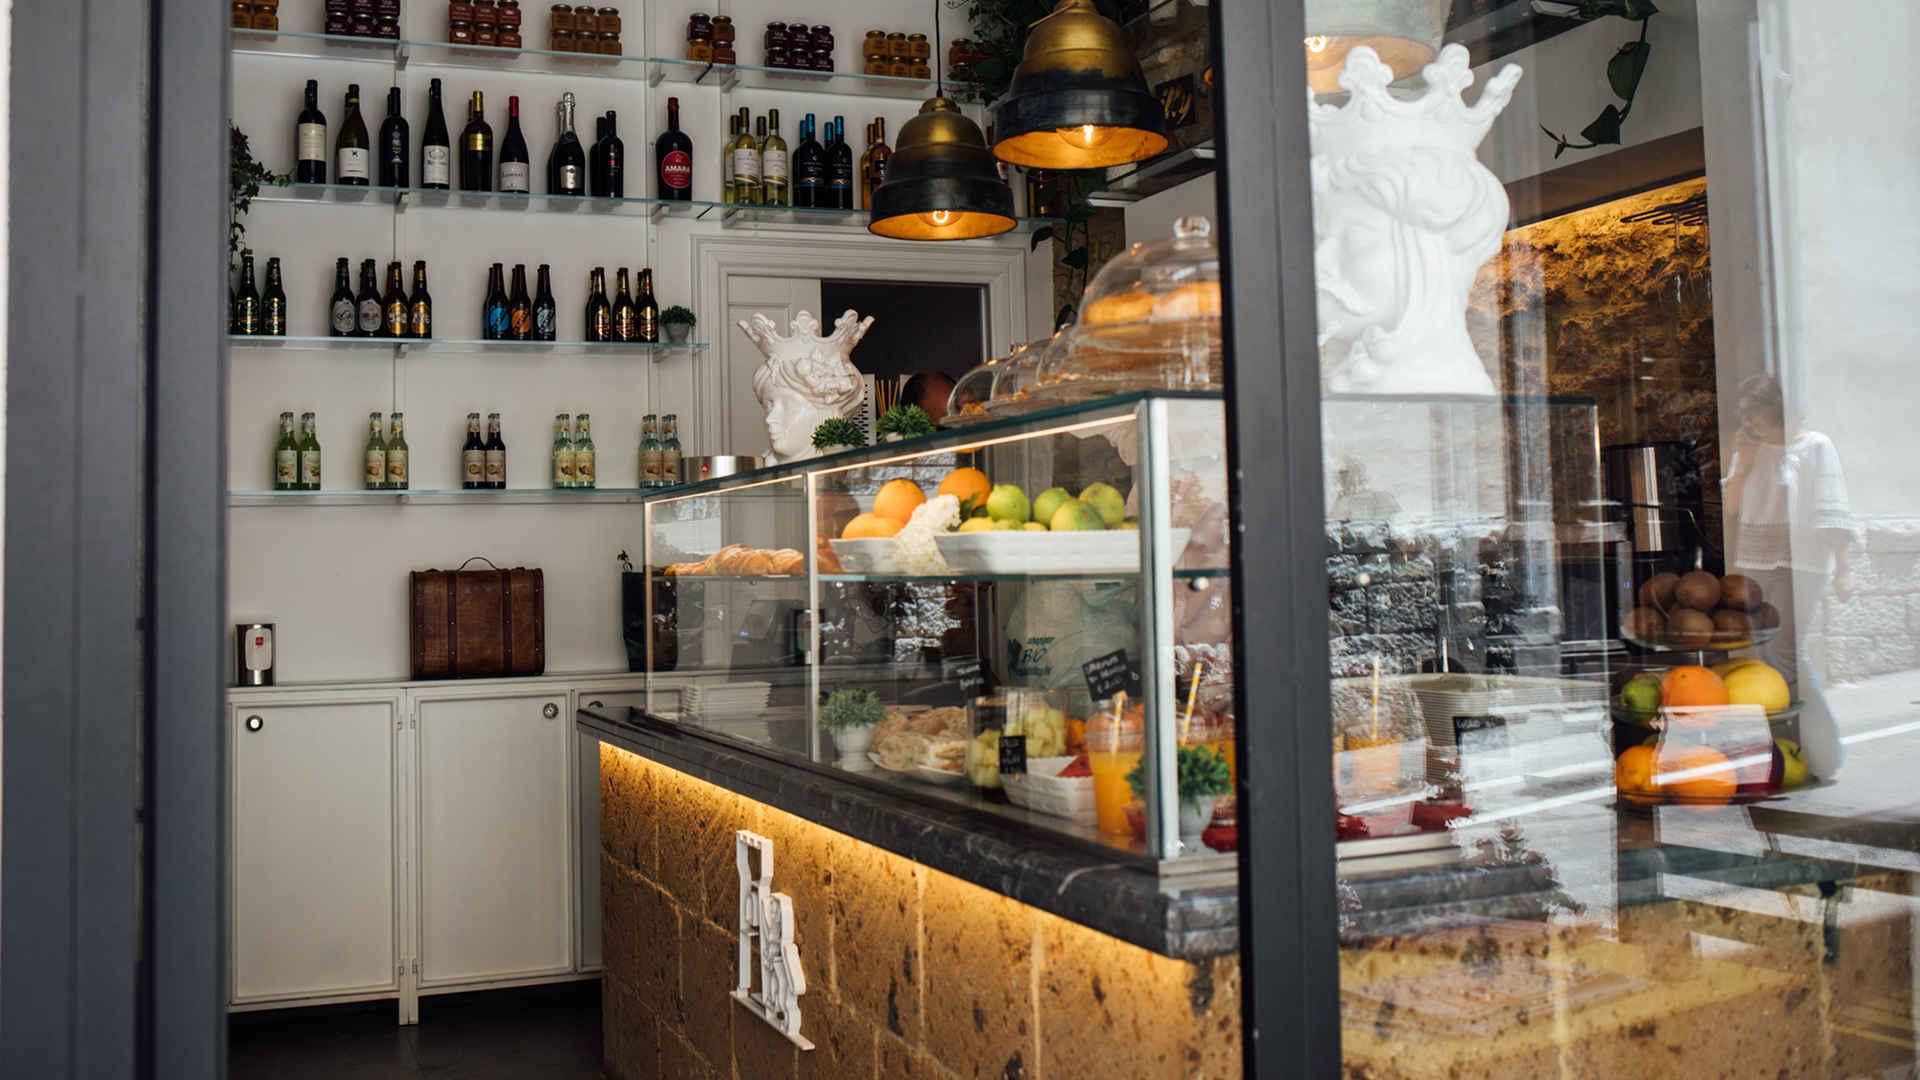 caffetteria Palazzo Natoli Exclusive Rooms - palazzonatoli.com